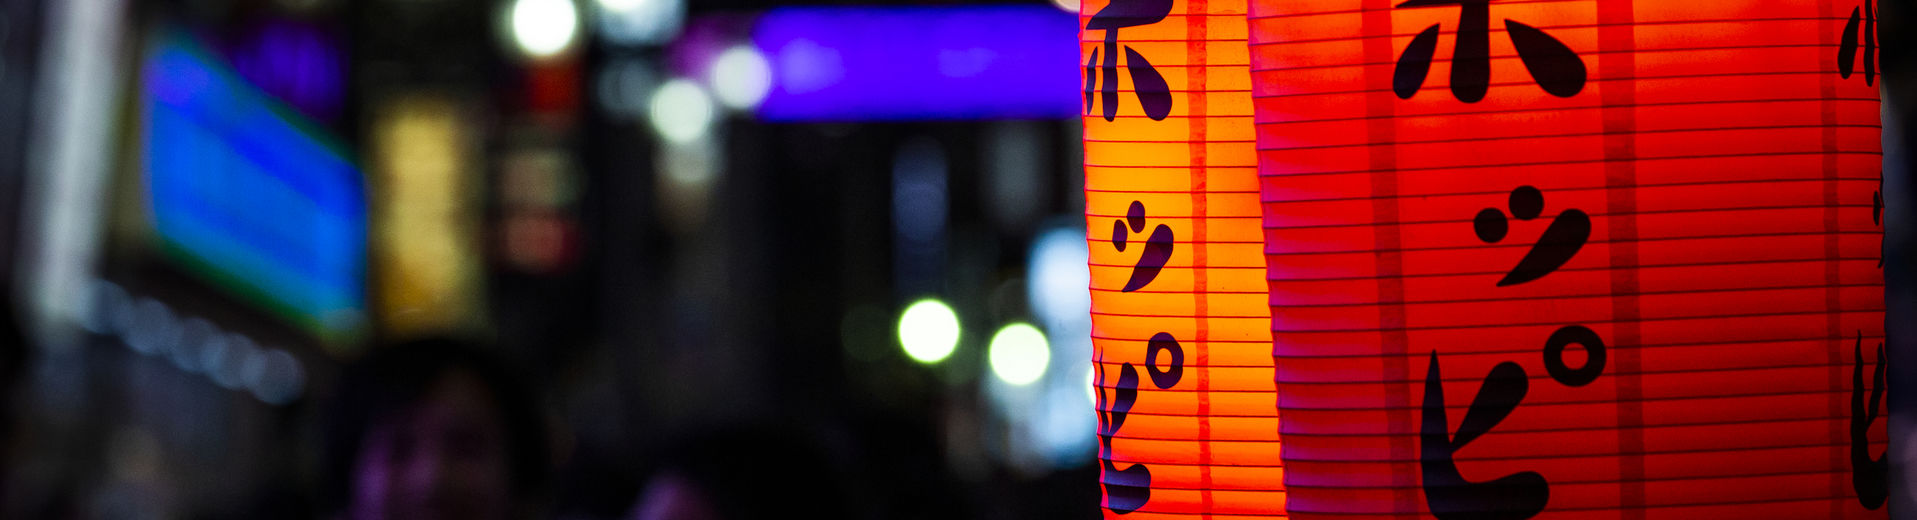 Brightly lit Japanese lanterns in Tokyo at night.